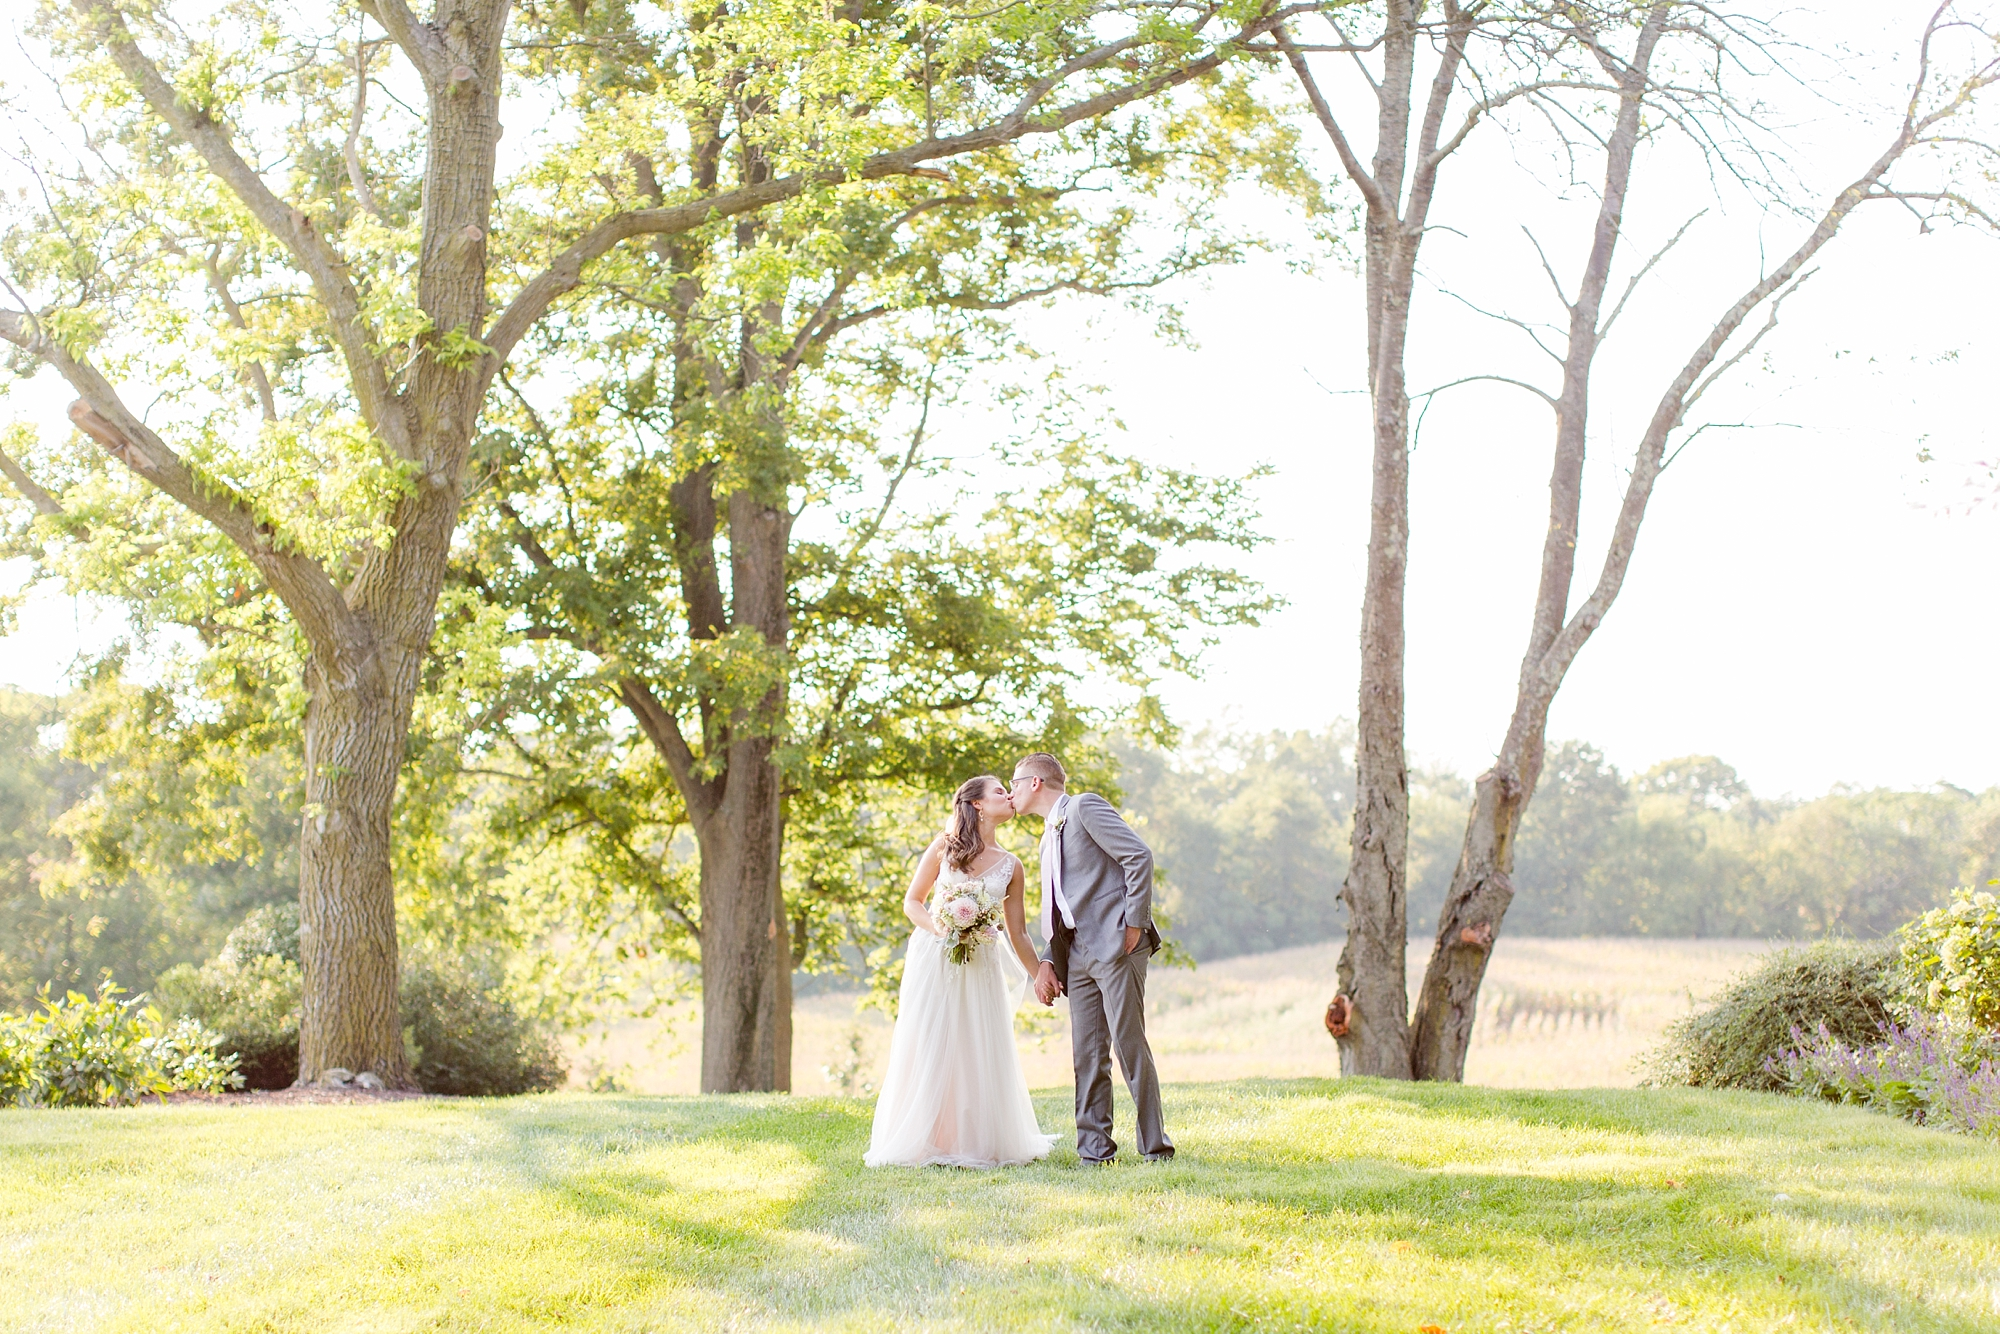 Tomaszewski 3-Bride & Groom-1076_anna grace photography baltimore maryland wedding photographer rockland estates wedding photo.jpg